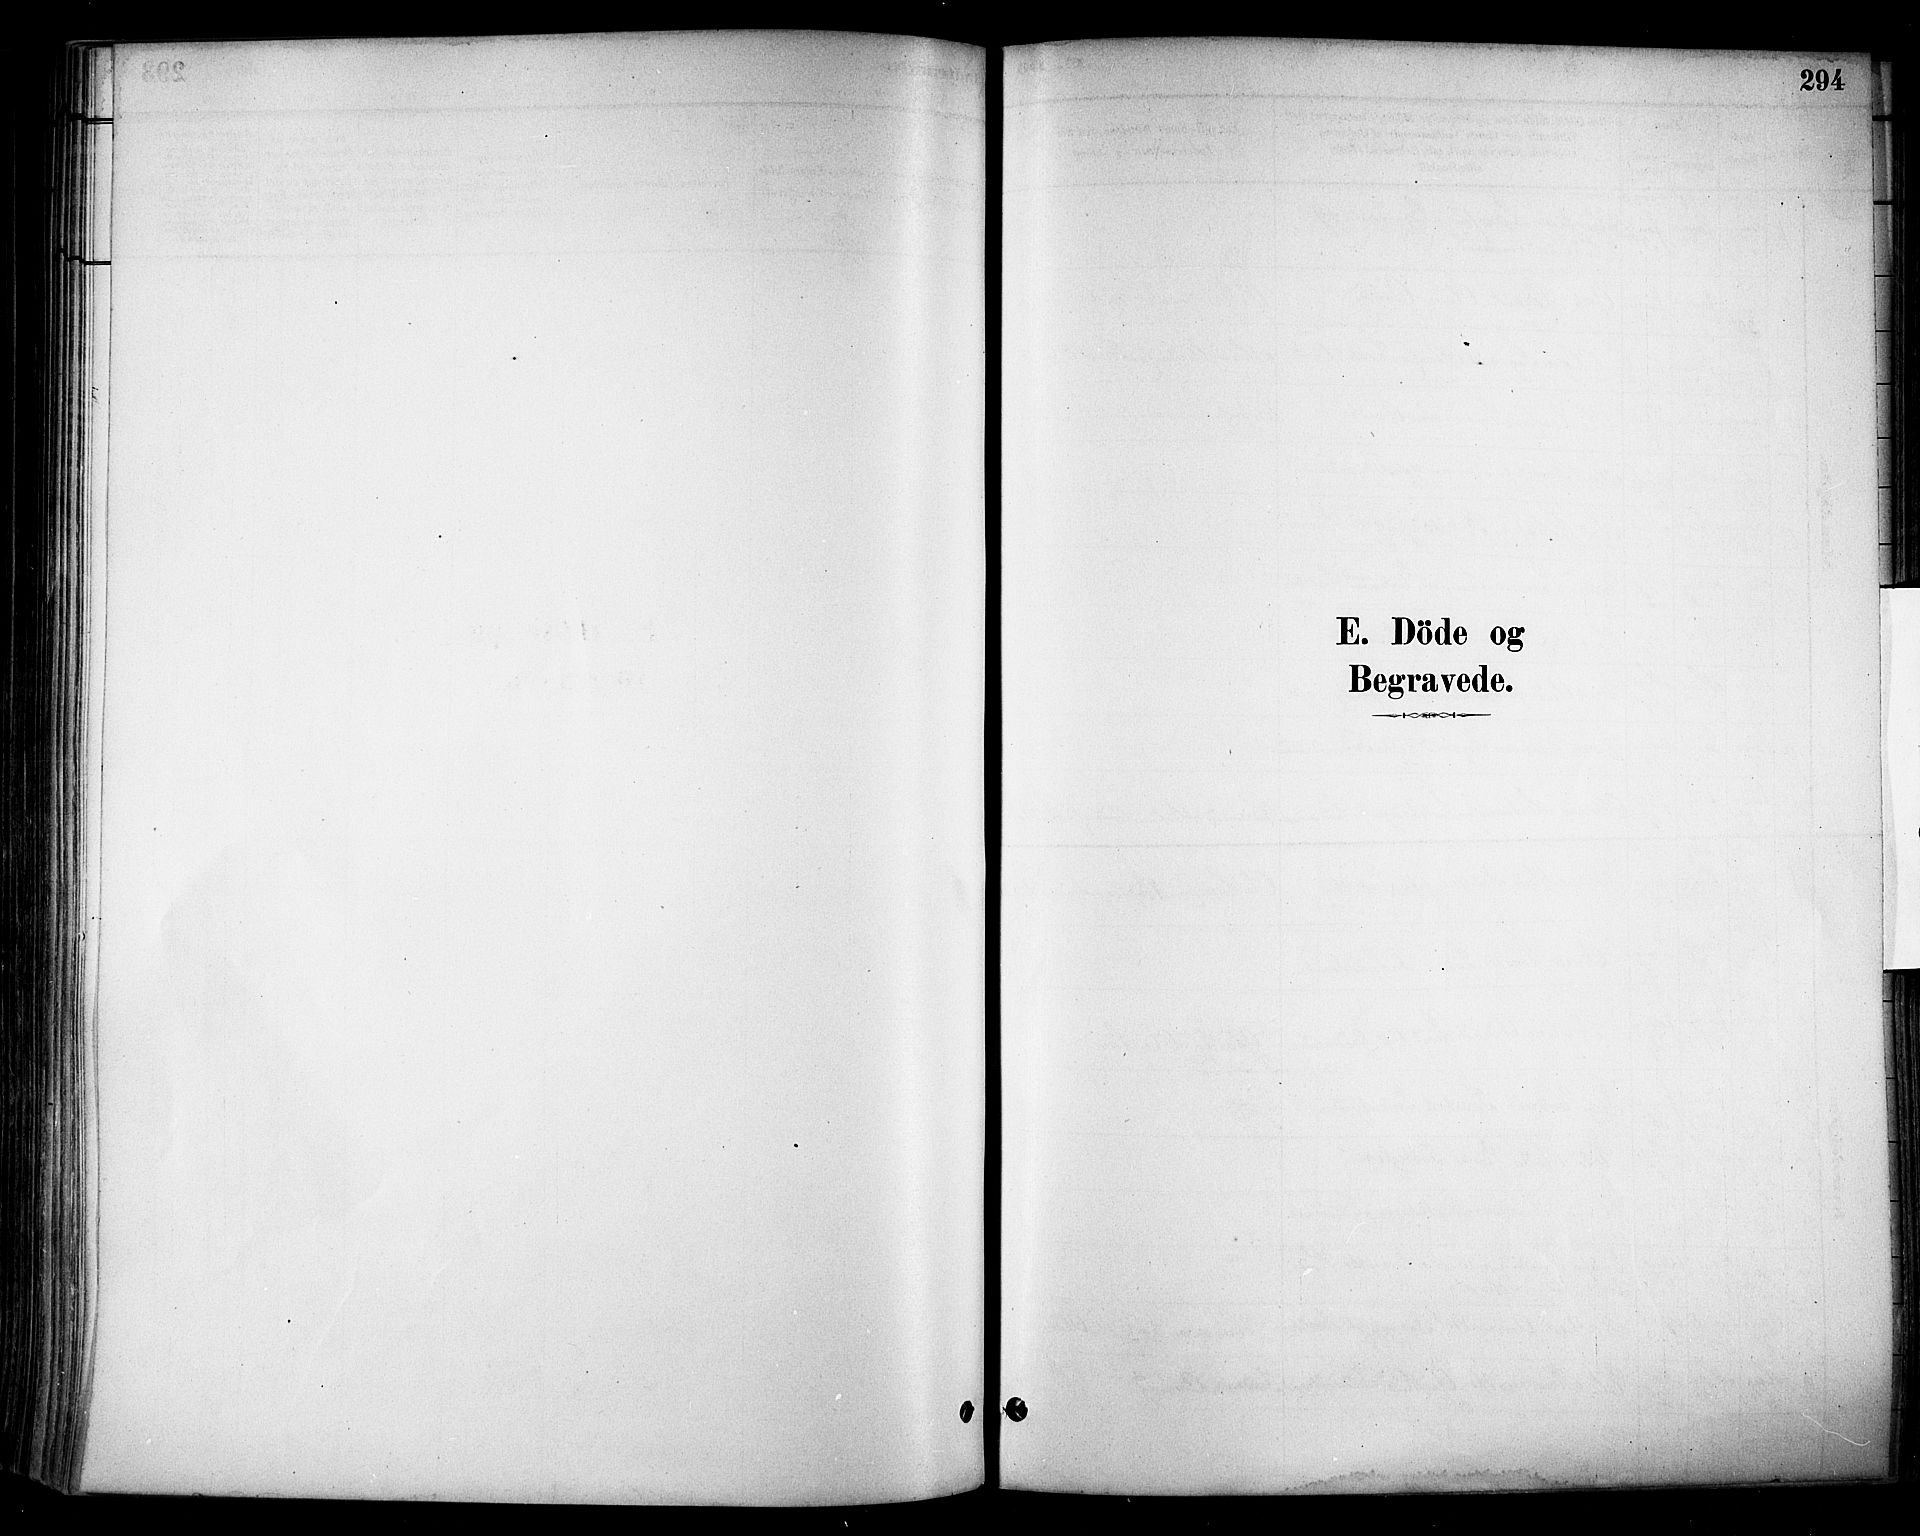 SAH, Stange prestekontor, K/L0017: Ministerialbok nr. 17, 1880-1893, s. 294